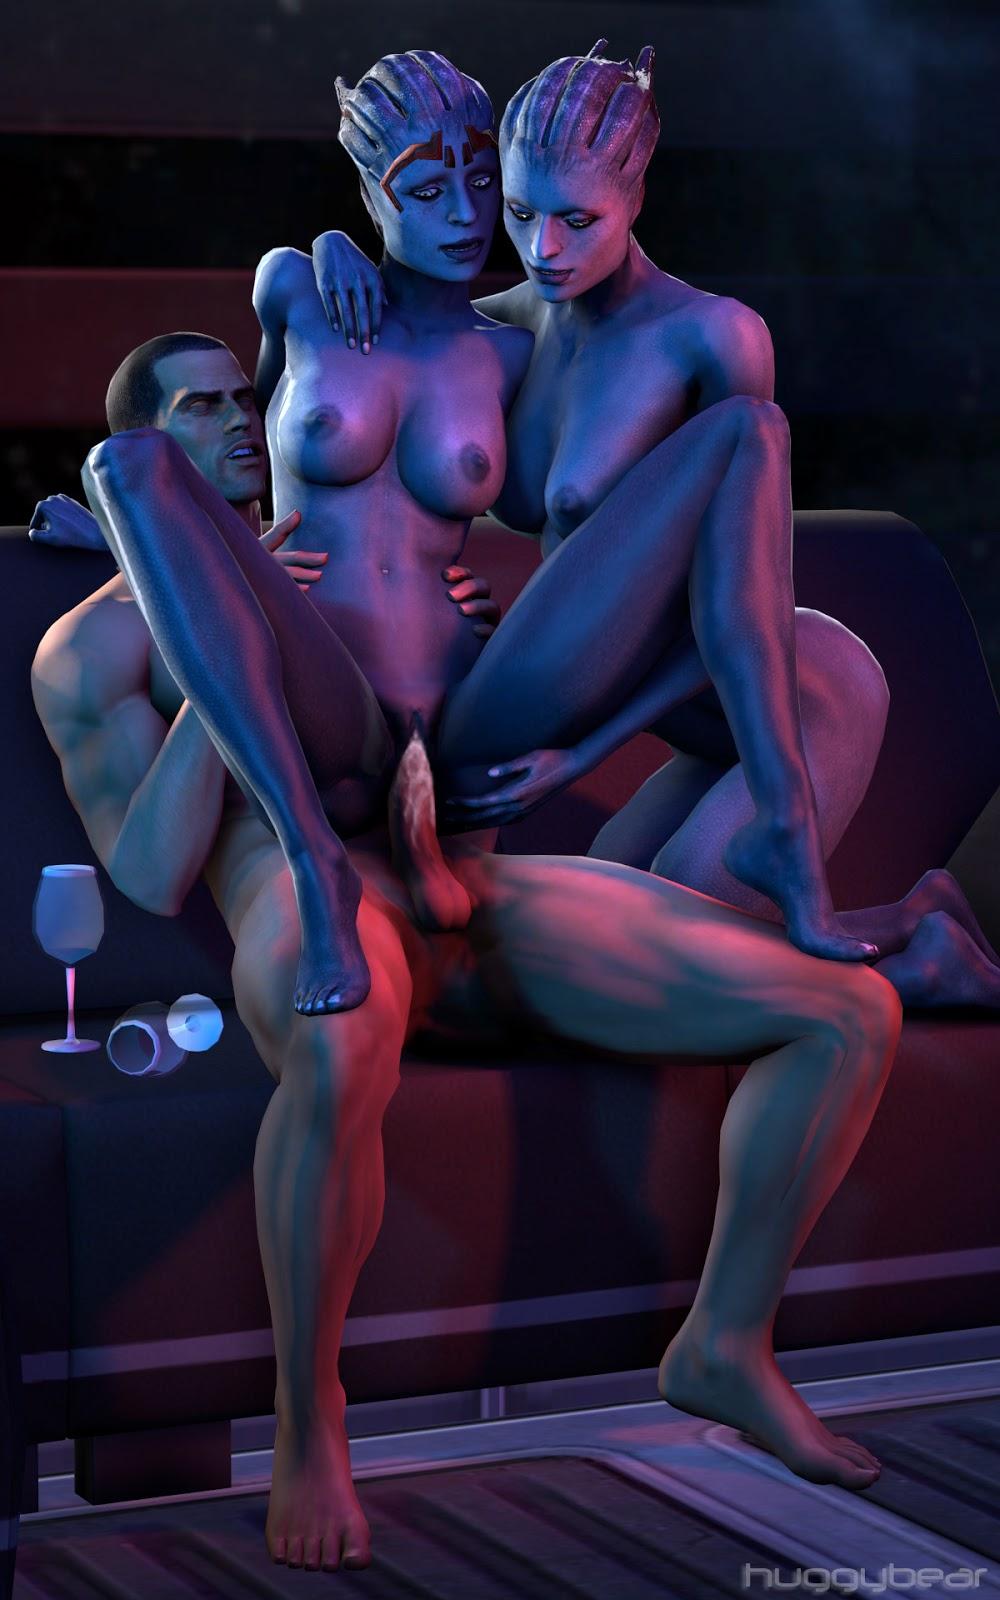 Image porno mass effect erotic pics